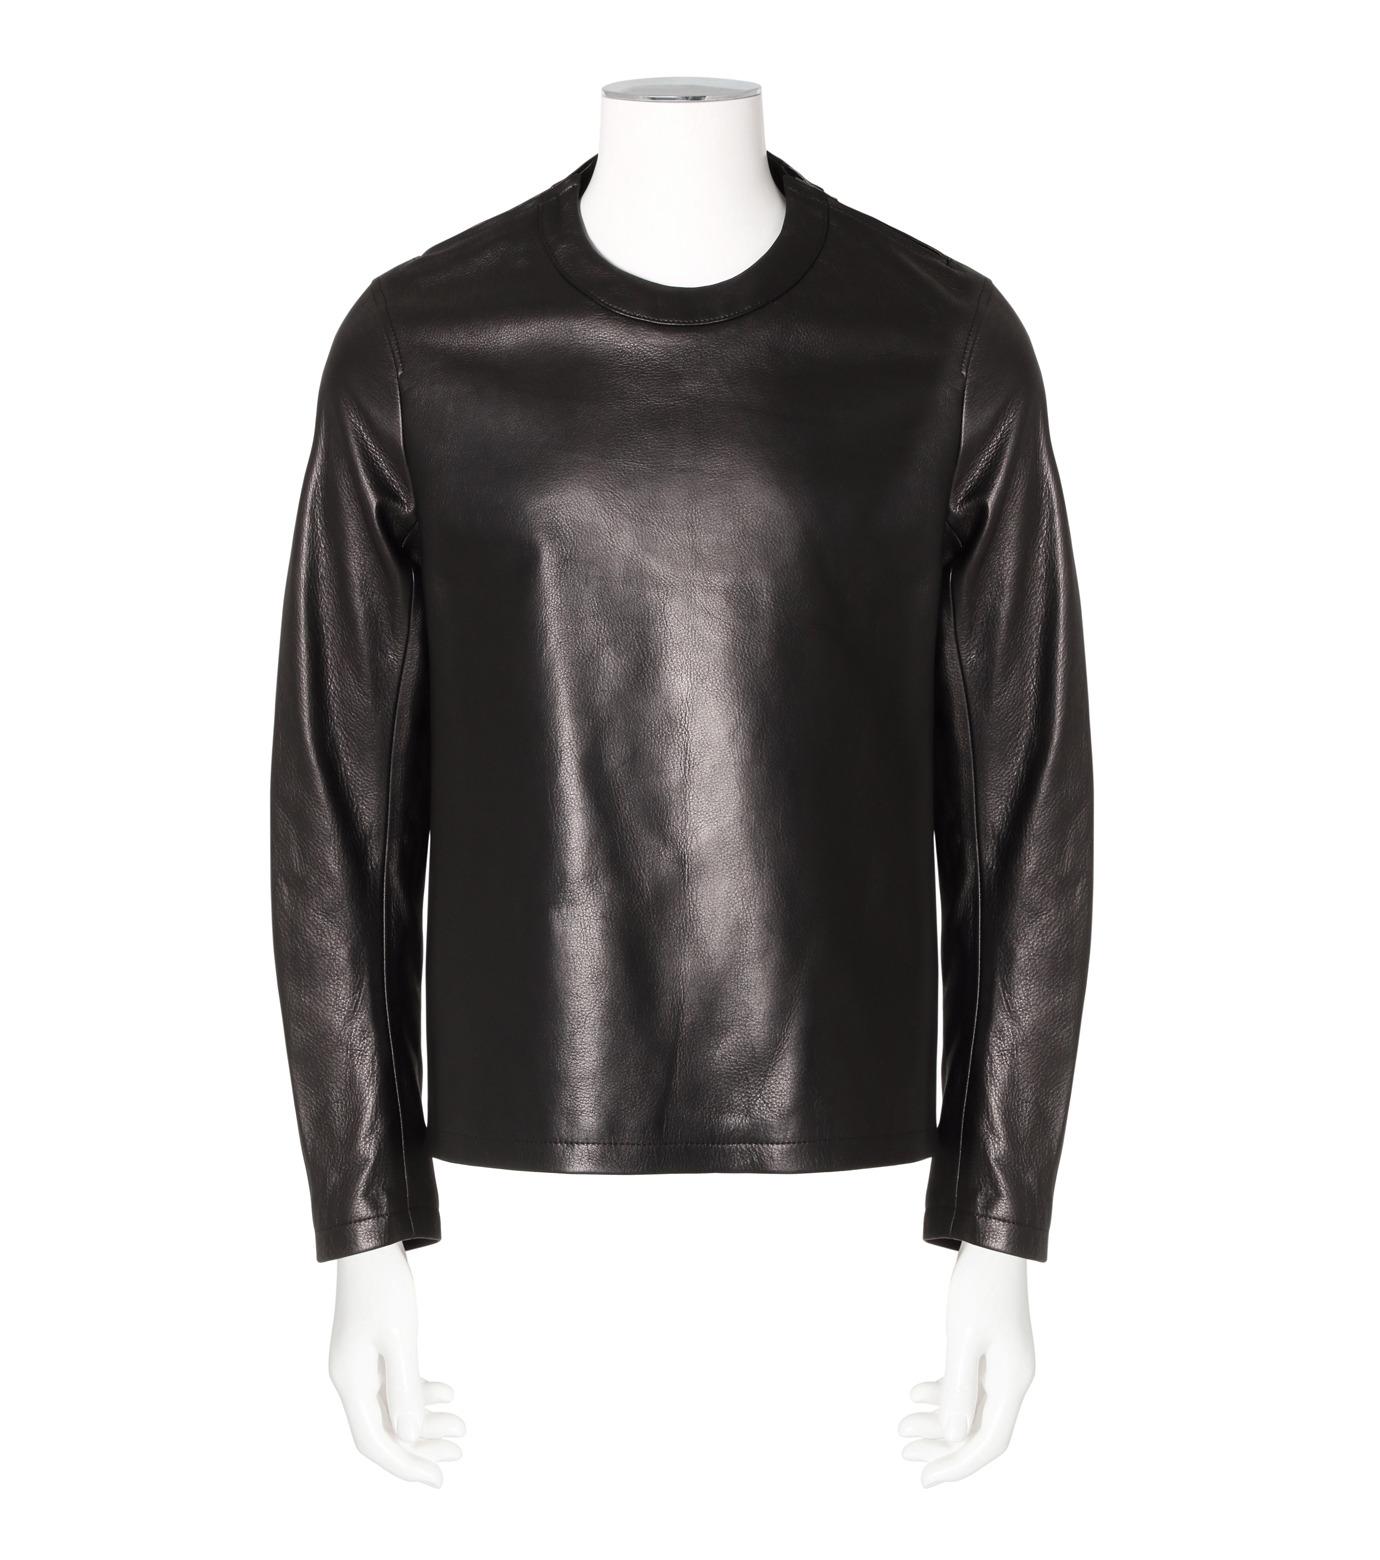 RAINMAKER(レインメーカー)のcrewneck leather shirt-BLACK-RM162-001-13 拡大詳細画像1